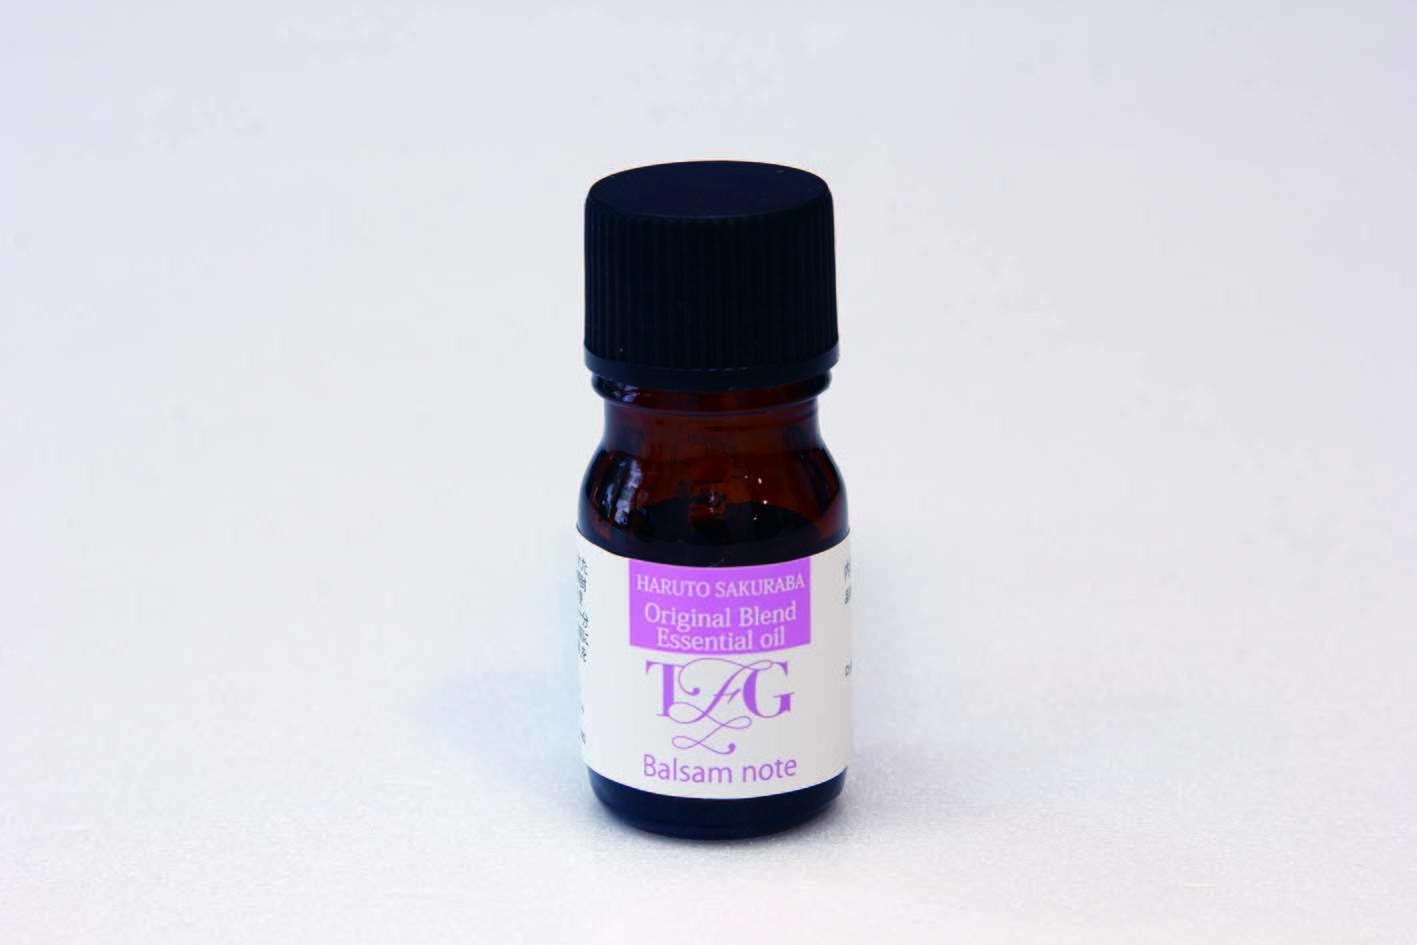 ⑥Haruto Sakuraba<Balsam note>オリジナルブレンドエッセンシャルオイル